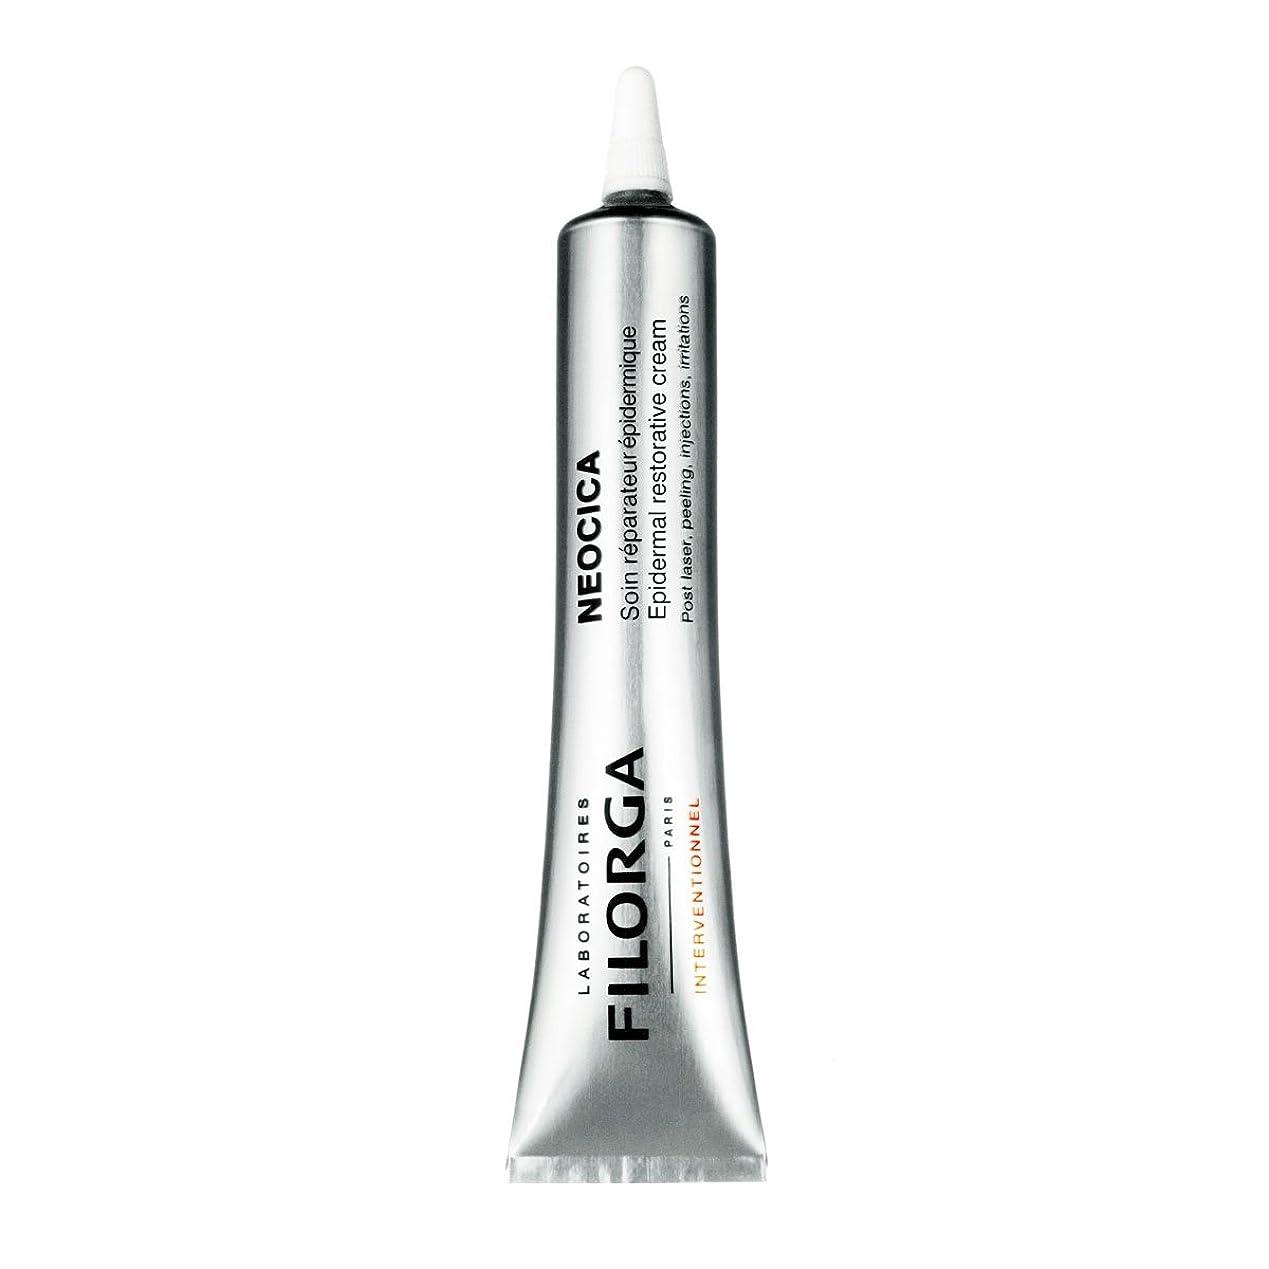 教義率直な以下Filorga Neocica Skin Repair 40ml [並行輸入品]